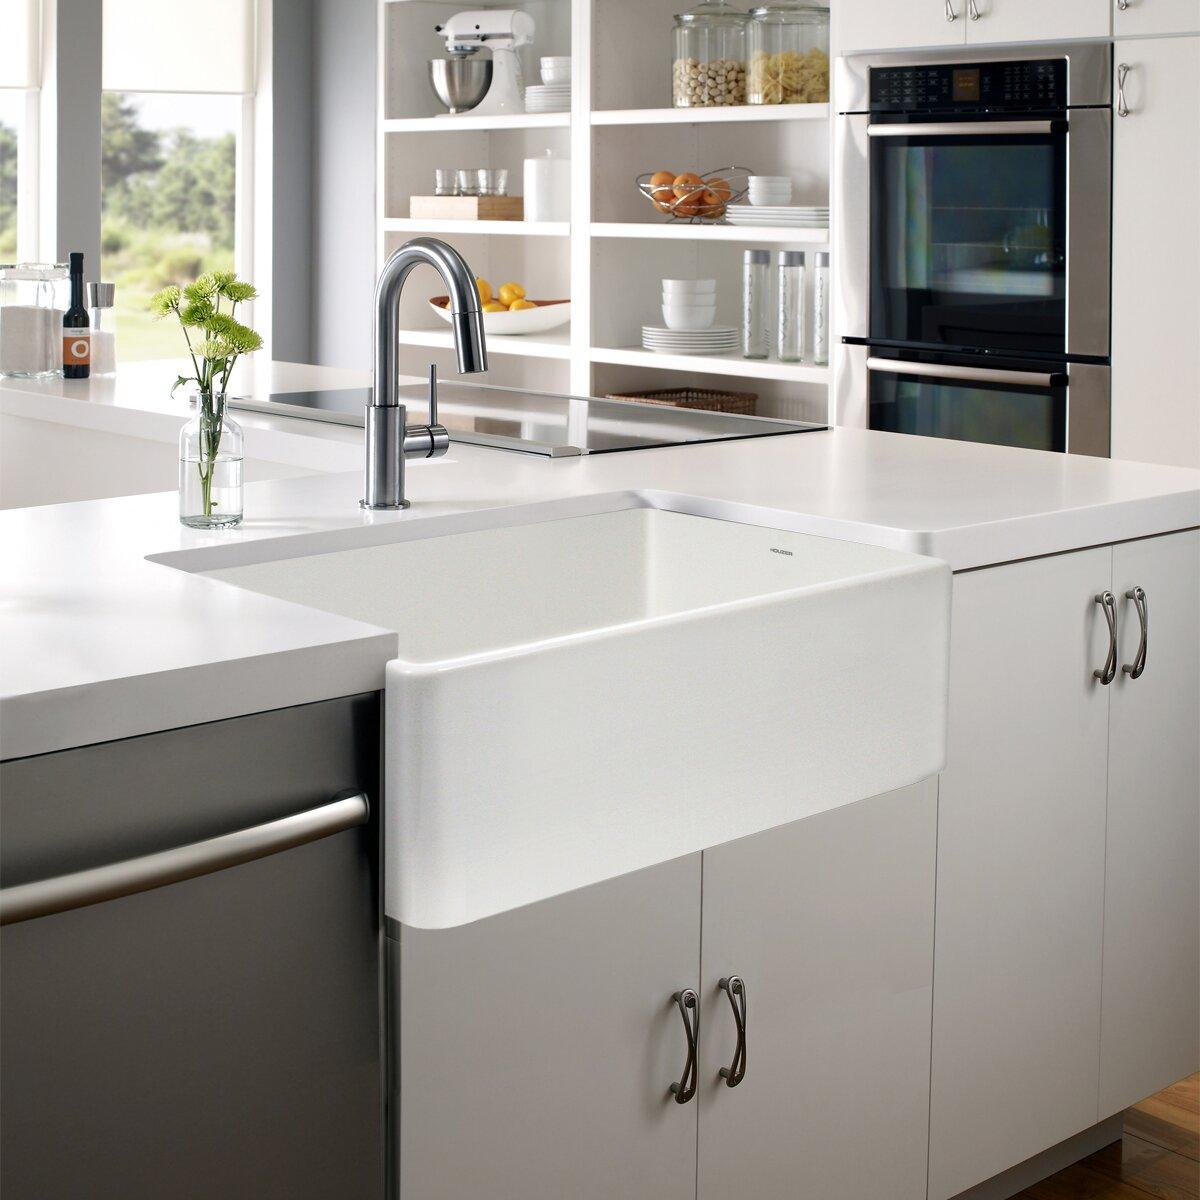 Drop In Farmhouse Kitchen Sink Apron Front Farmhouse Kitchen Sinks Best Kitchen Ideas 2017